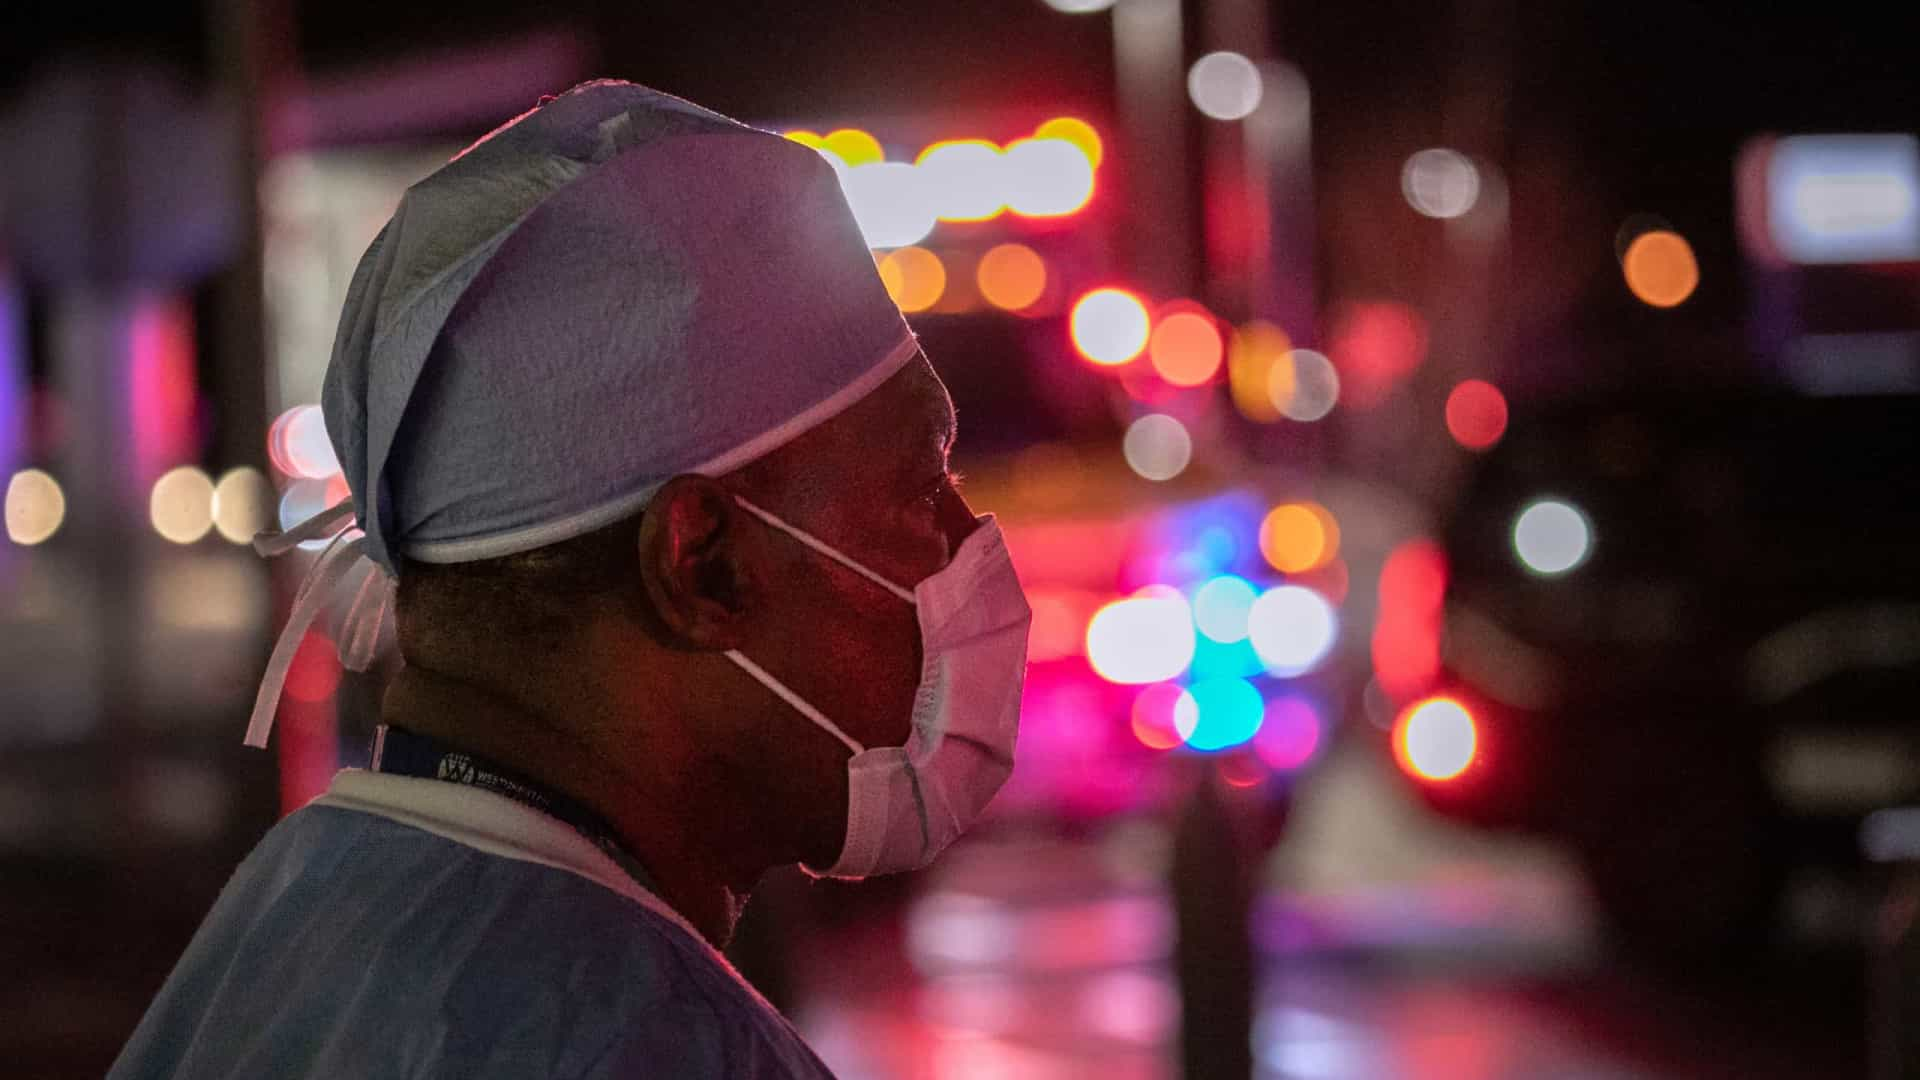 Brasil registra 1.340 mortes por covid-19 em 24h